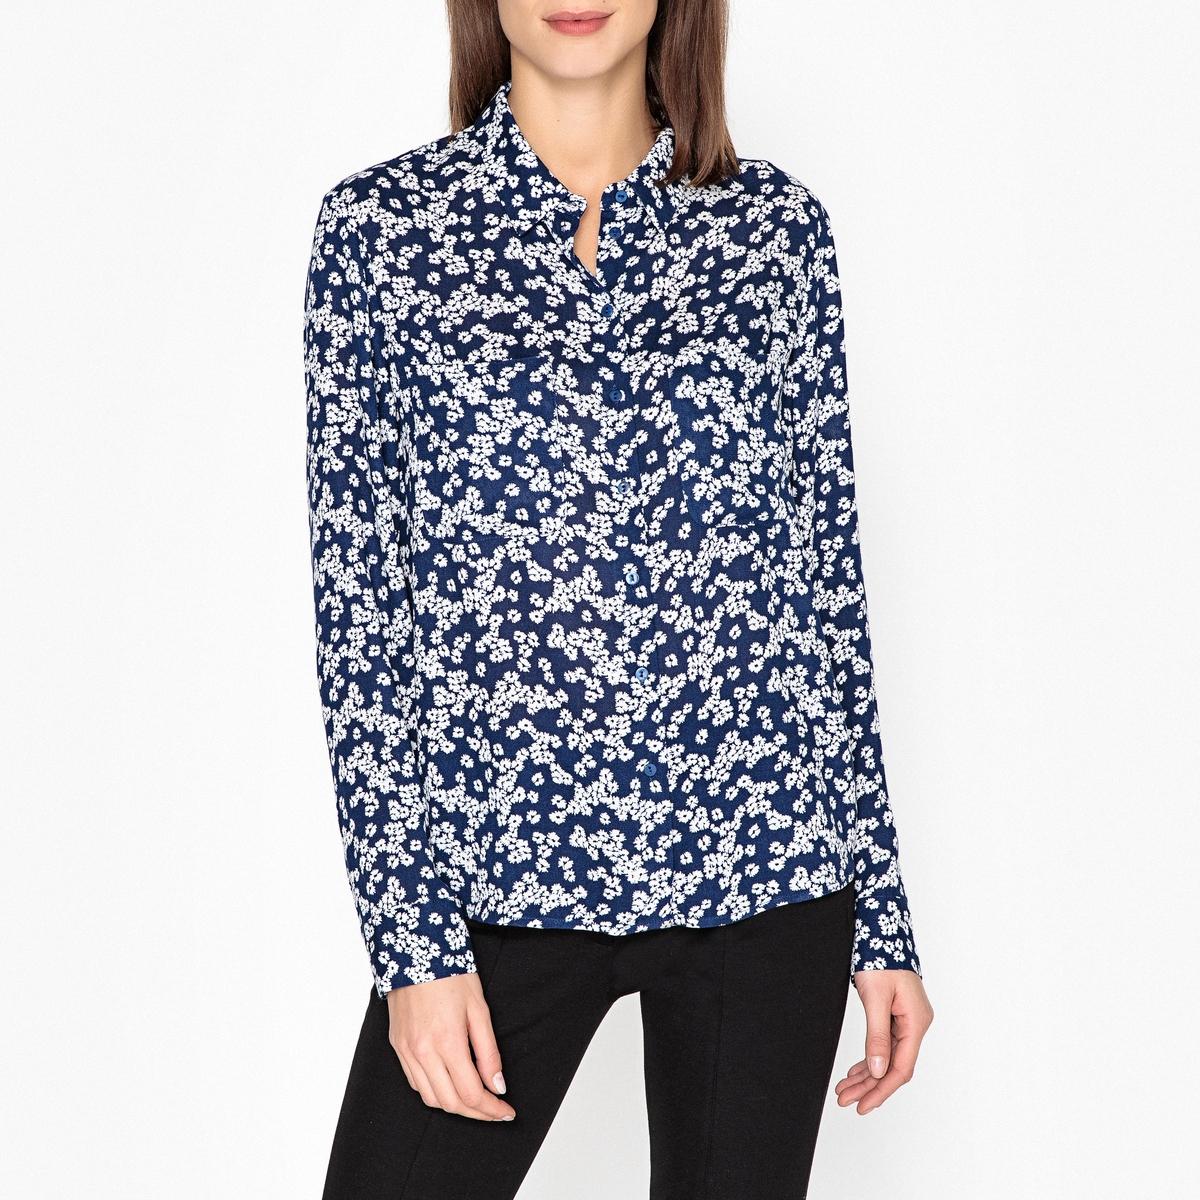 Рубашка с рисунком, длинные рукава женская рубашка european and american big c002617 2015